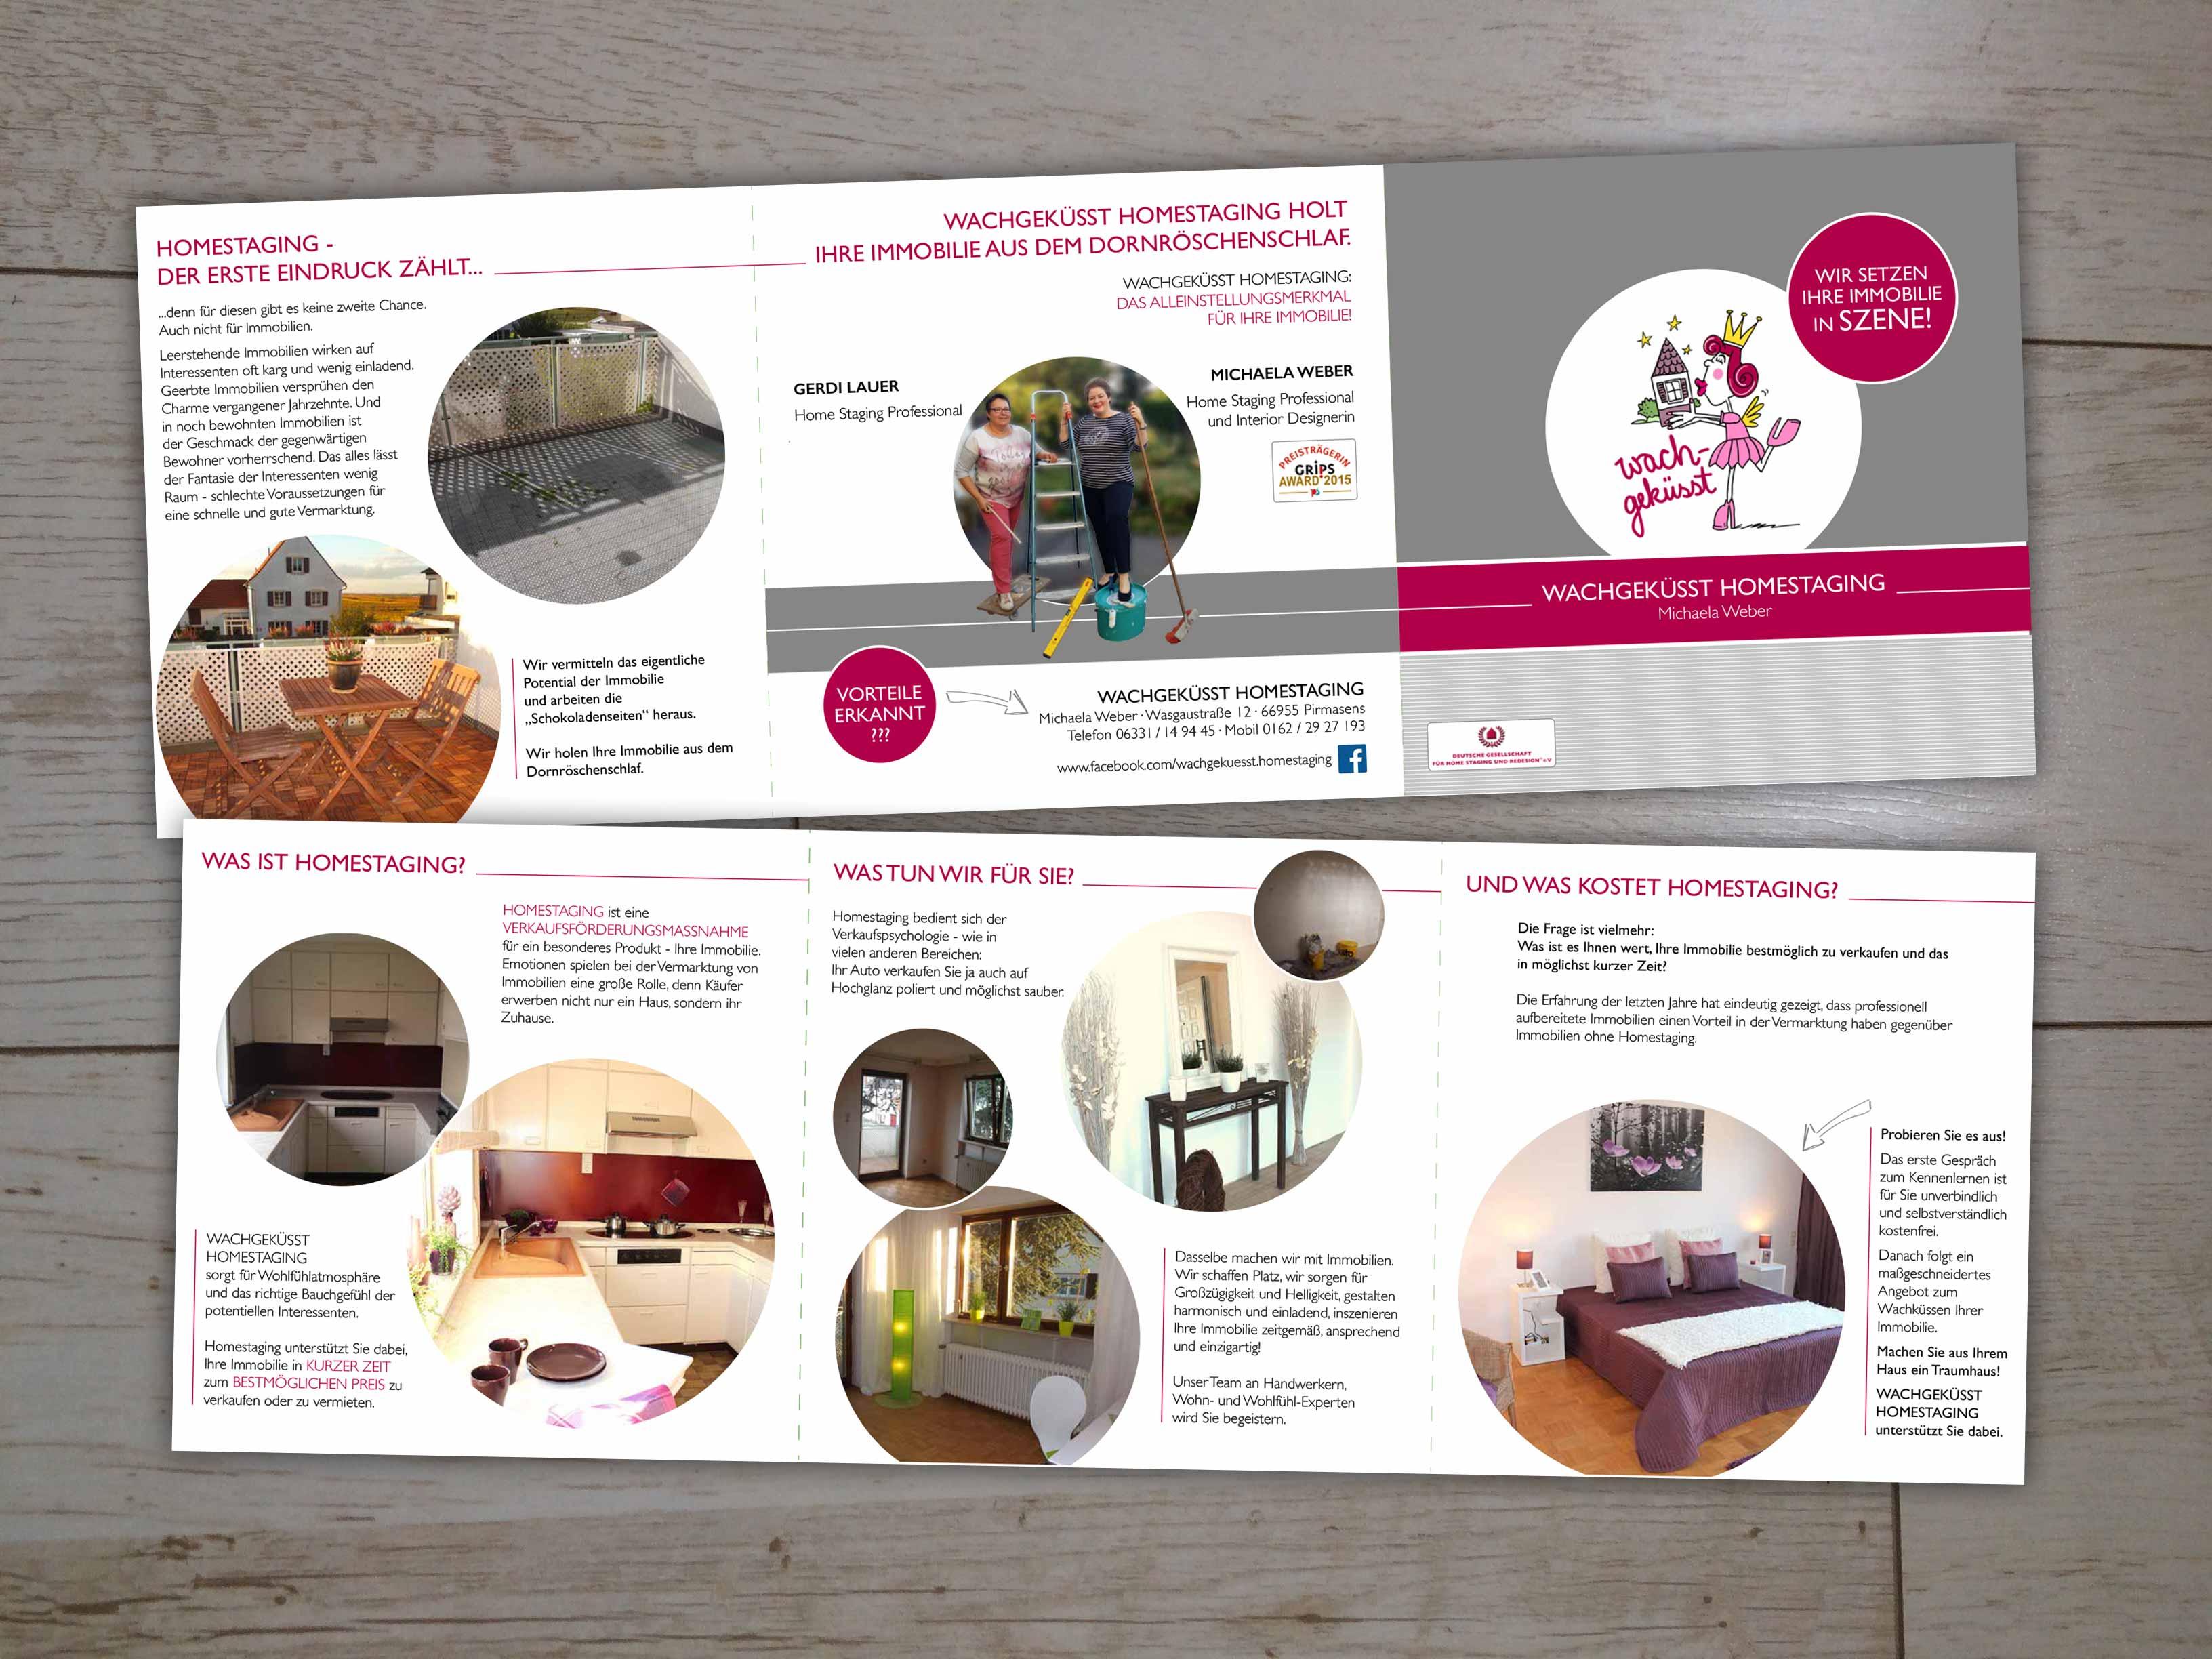 Wachgeküsst Homestaging Flyer In Quadratform Print Design Saarland